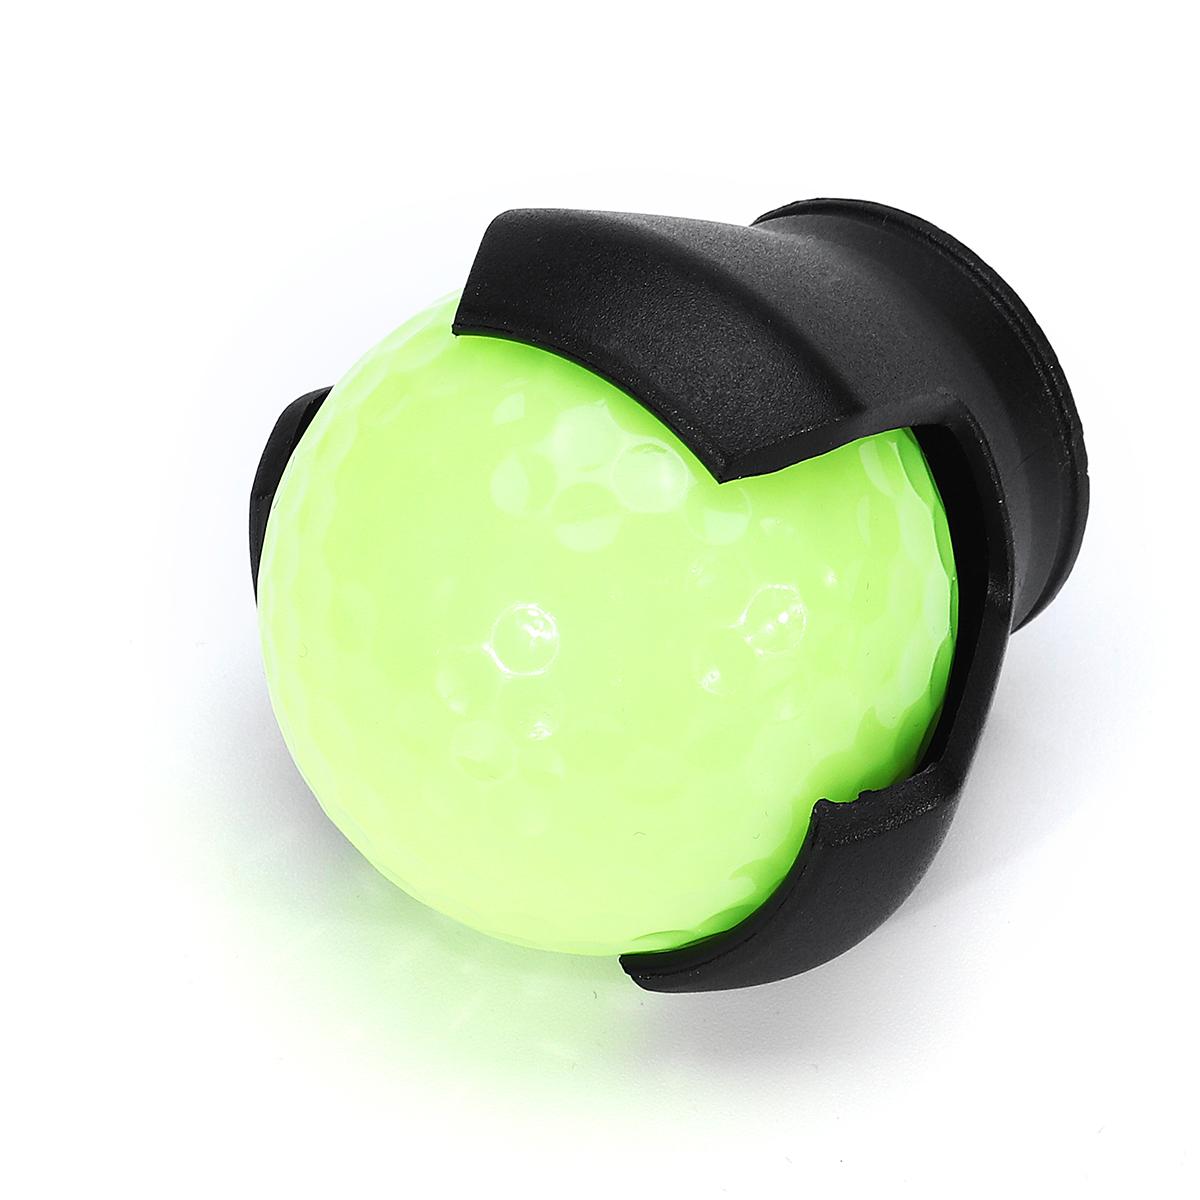 1 Pcs Luminous Golf Ball Bright Ball For Night Use Golf Accessories